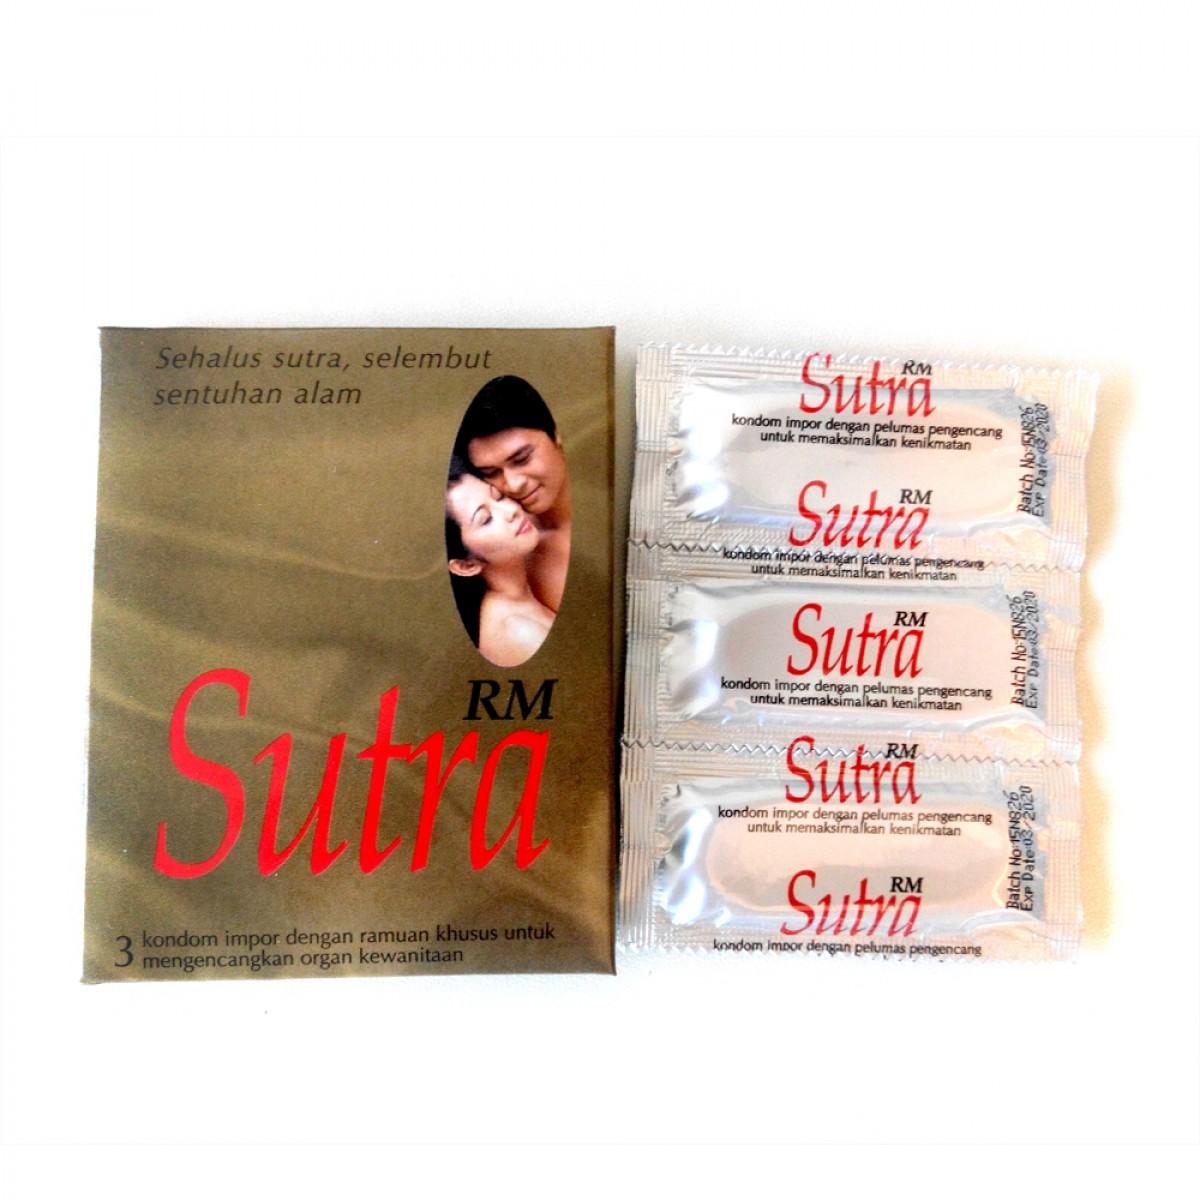 Sutra Rm Manjakani V Tightening Condom 3s Fiesta Lubricant Strawberry Pelumas